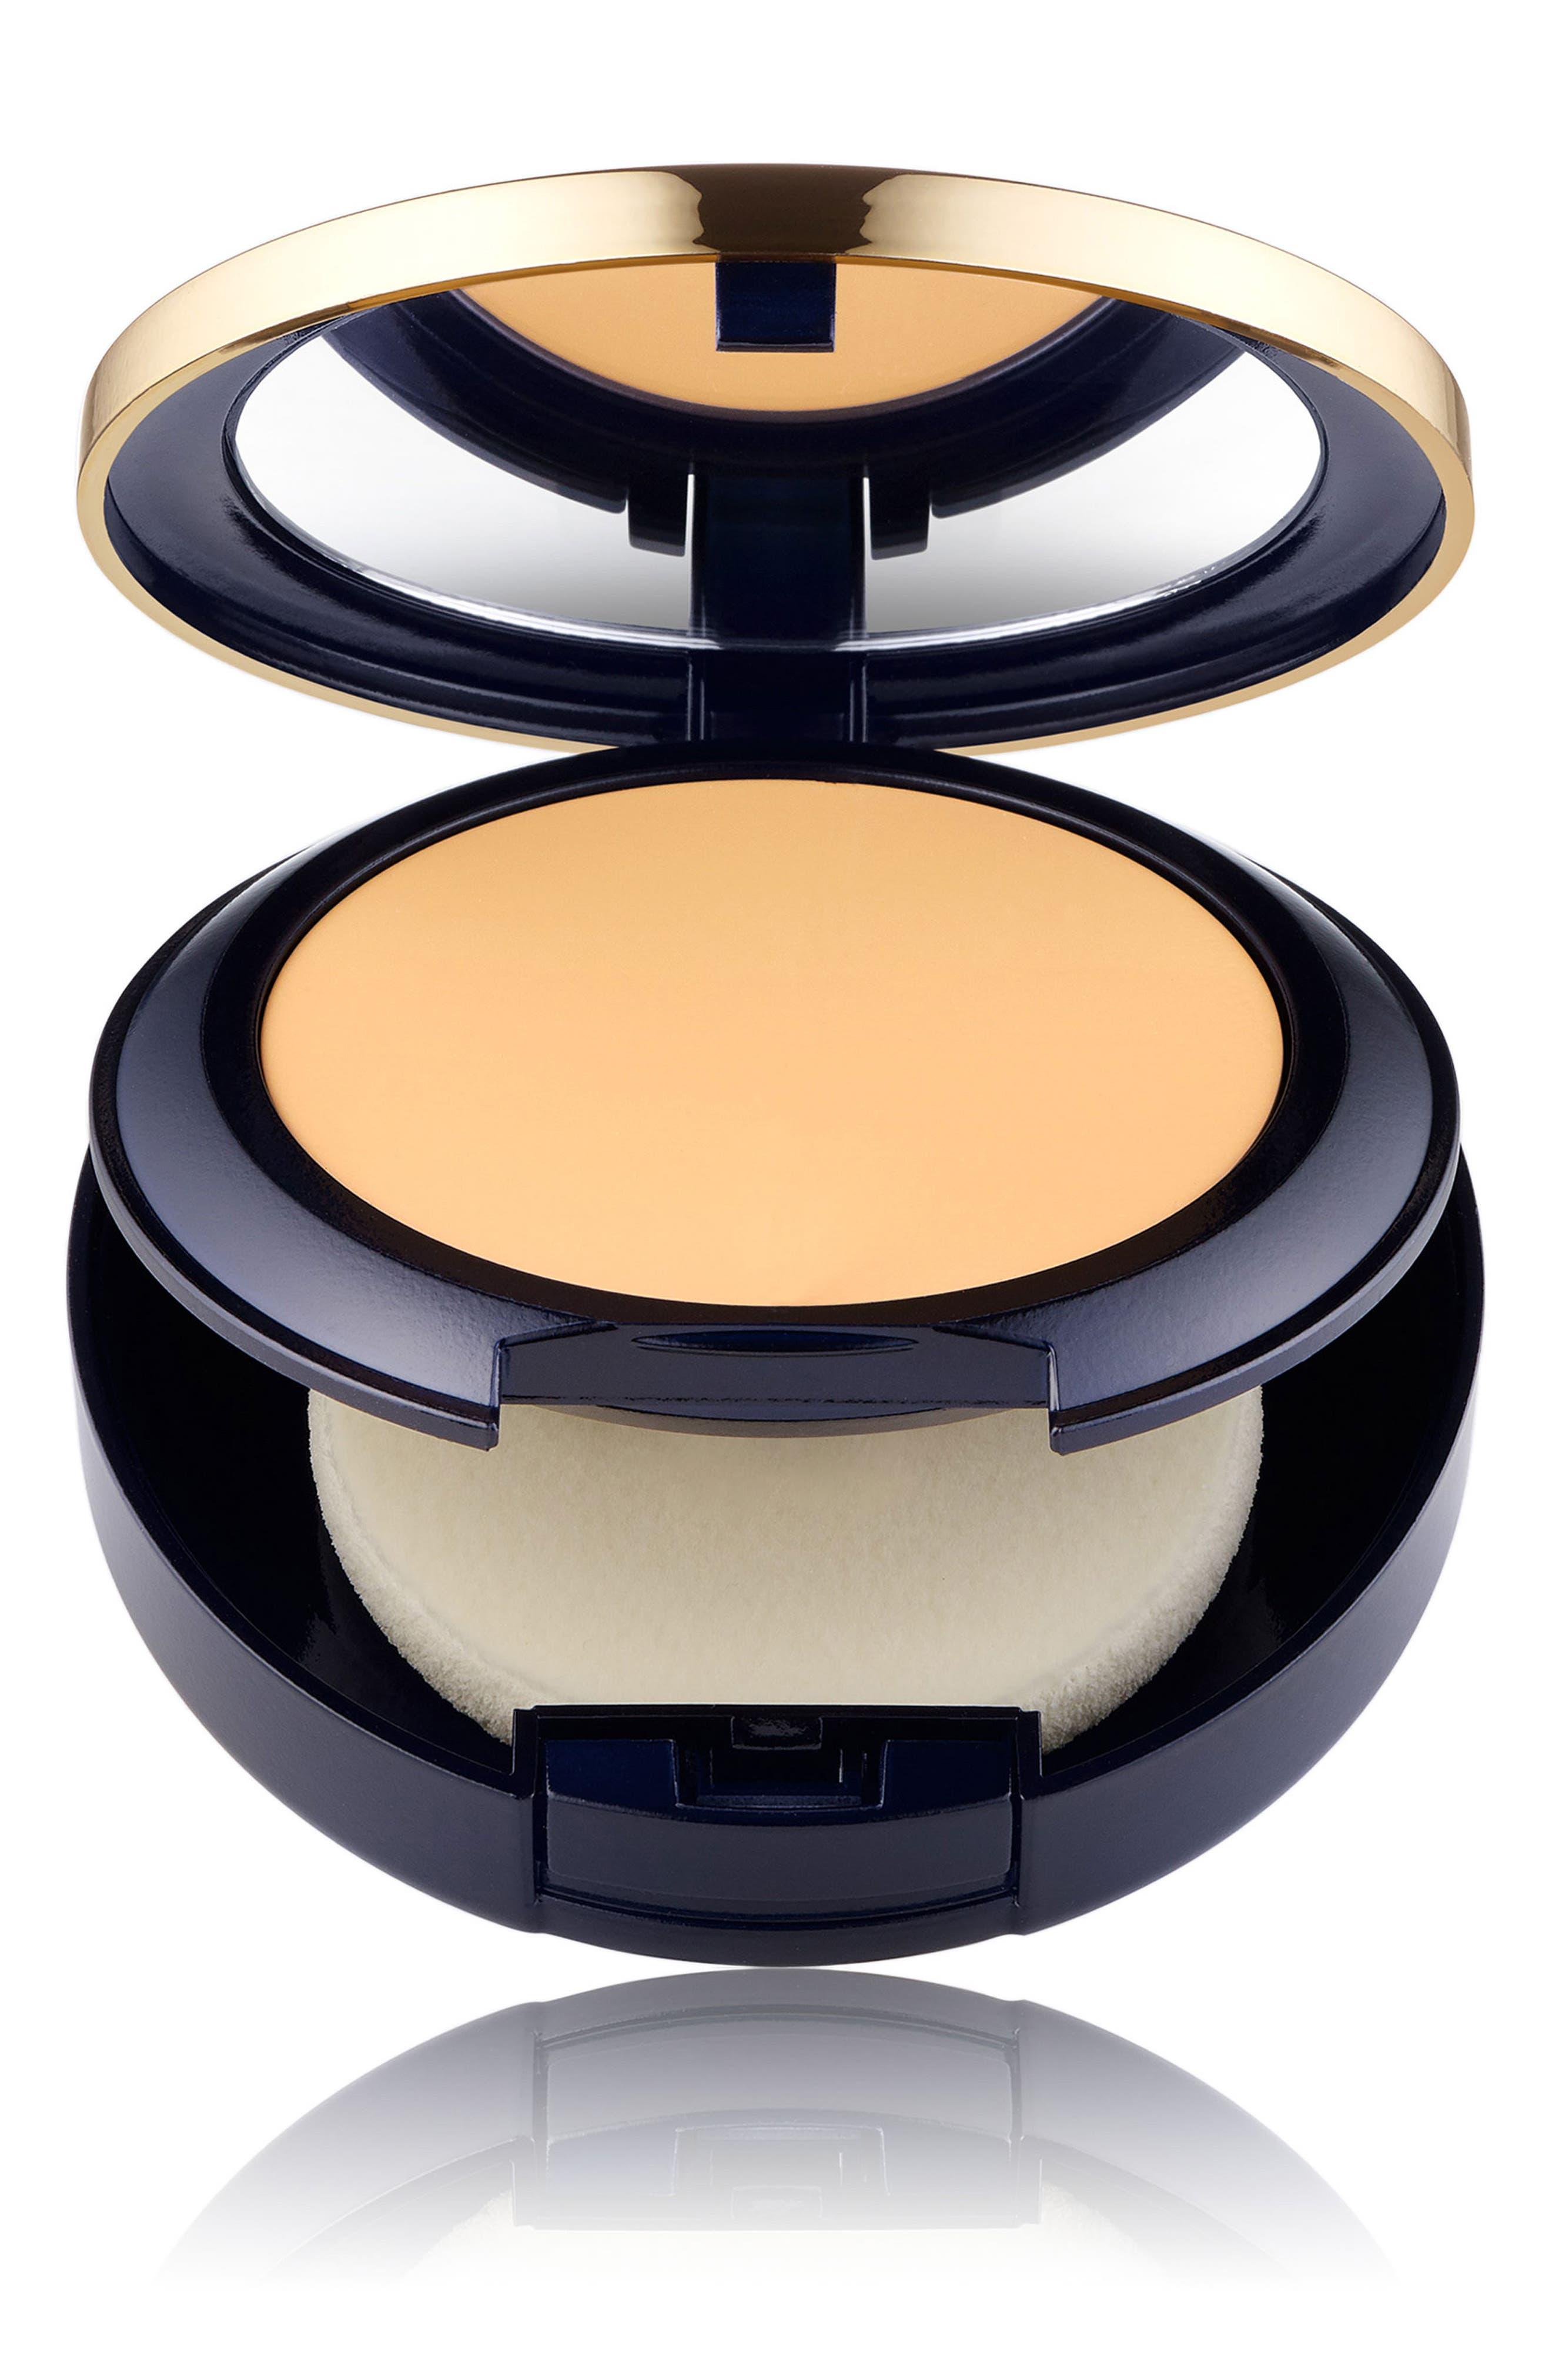 Estee Lauder Double Wear Stay In Place Matte Powder Foundation - 3W1.5 Fawn